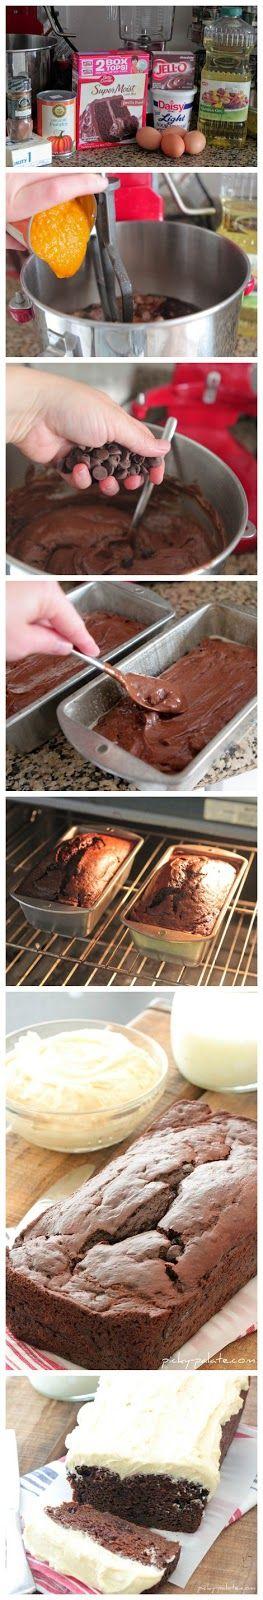 Double Chocolate Pumpkin Cake with Pumpkin Spice Buttercream